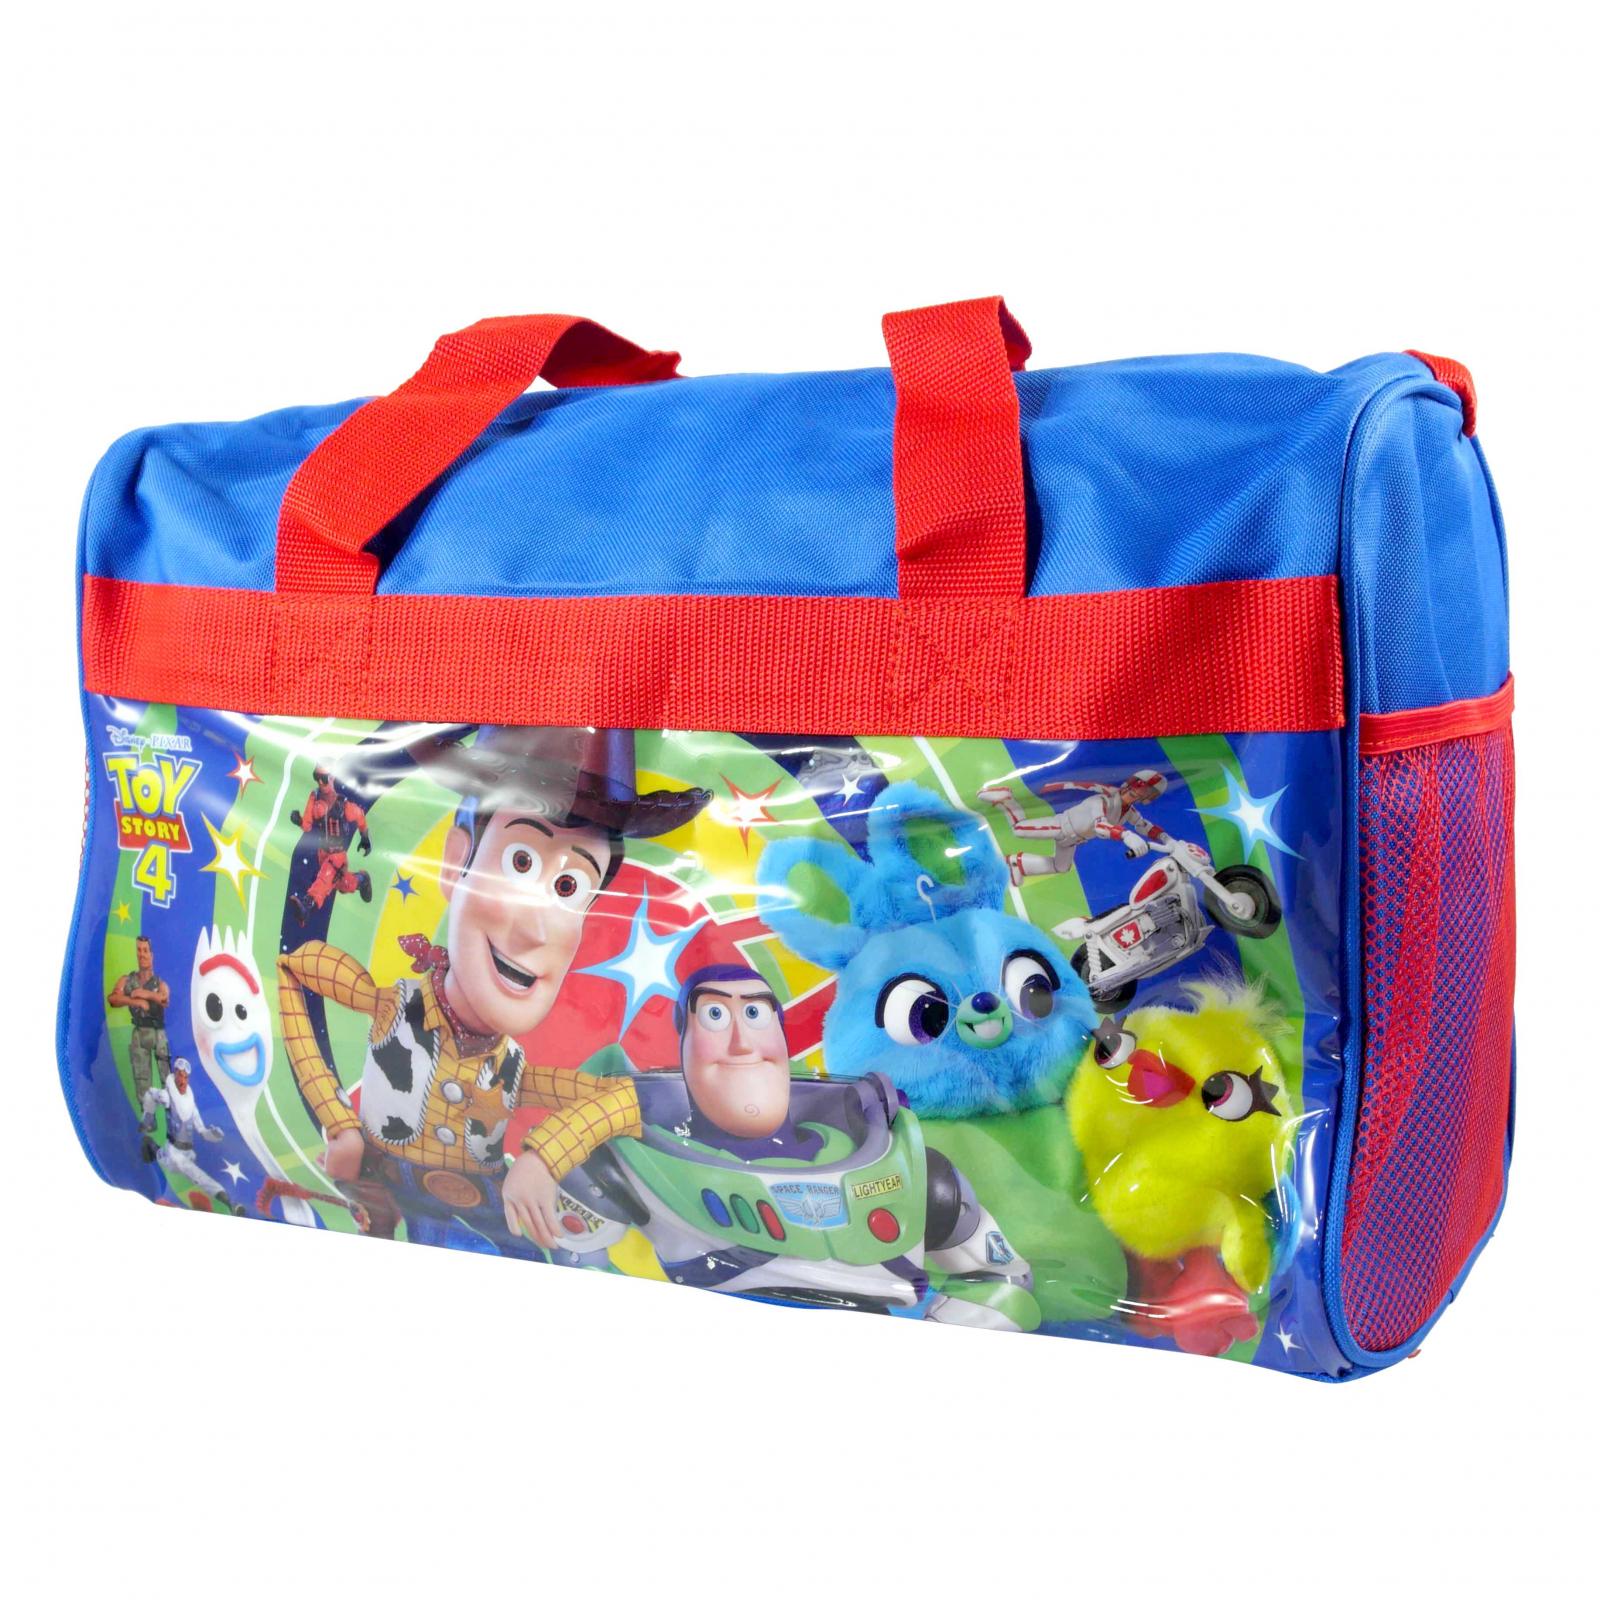 Disney Pixar Toy Story 4 Travel Duffel Bag Luggage For Kids